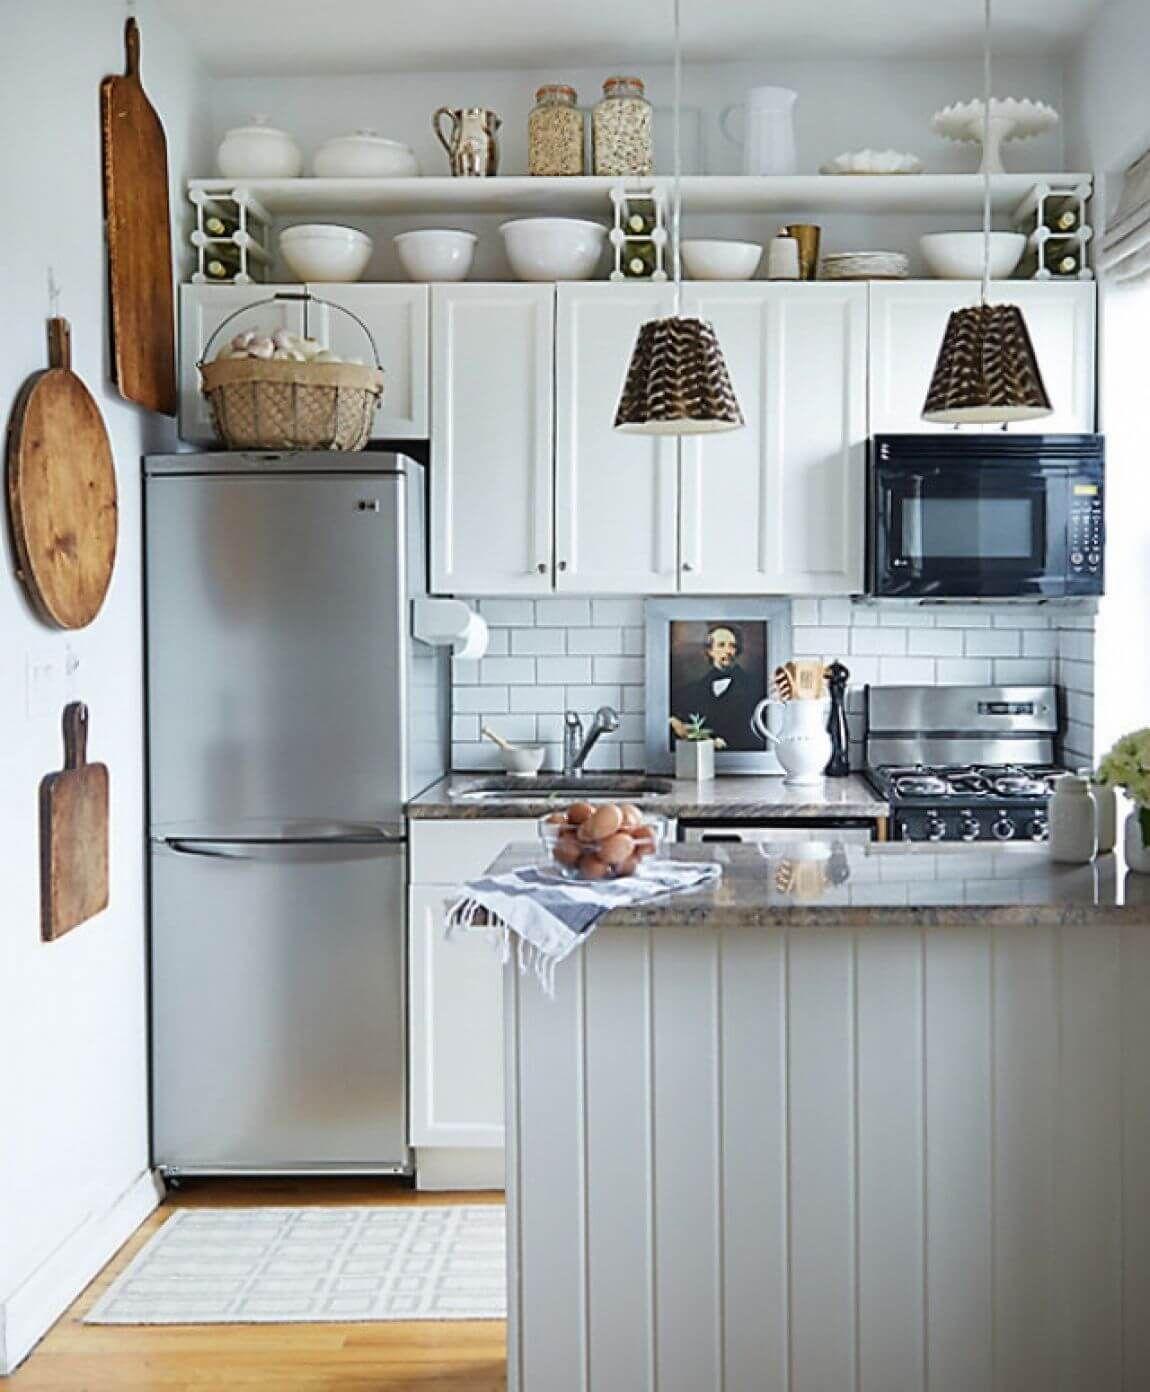 3 Attractive Small Kitchen Decor Ideas Kitchen Remodel Small Small Space Kitchen Small Apartment Kitchen